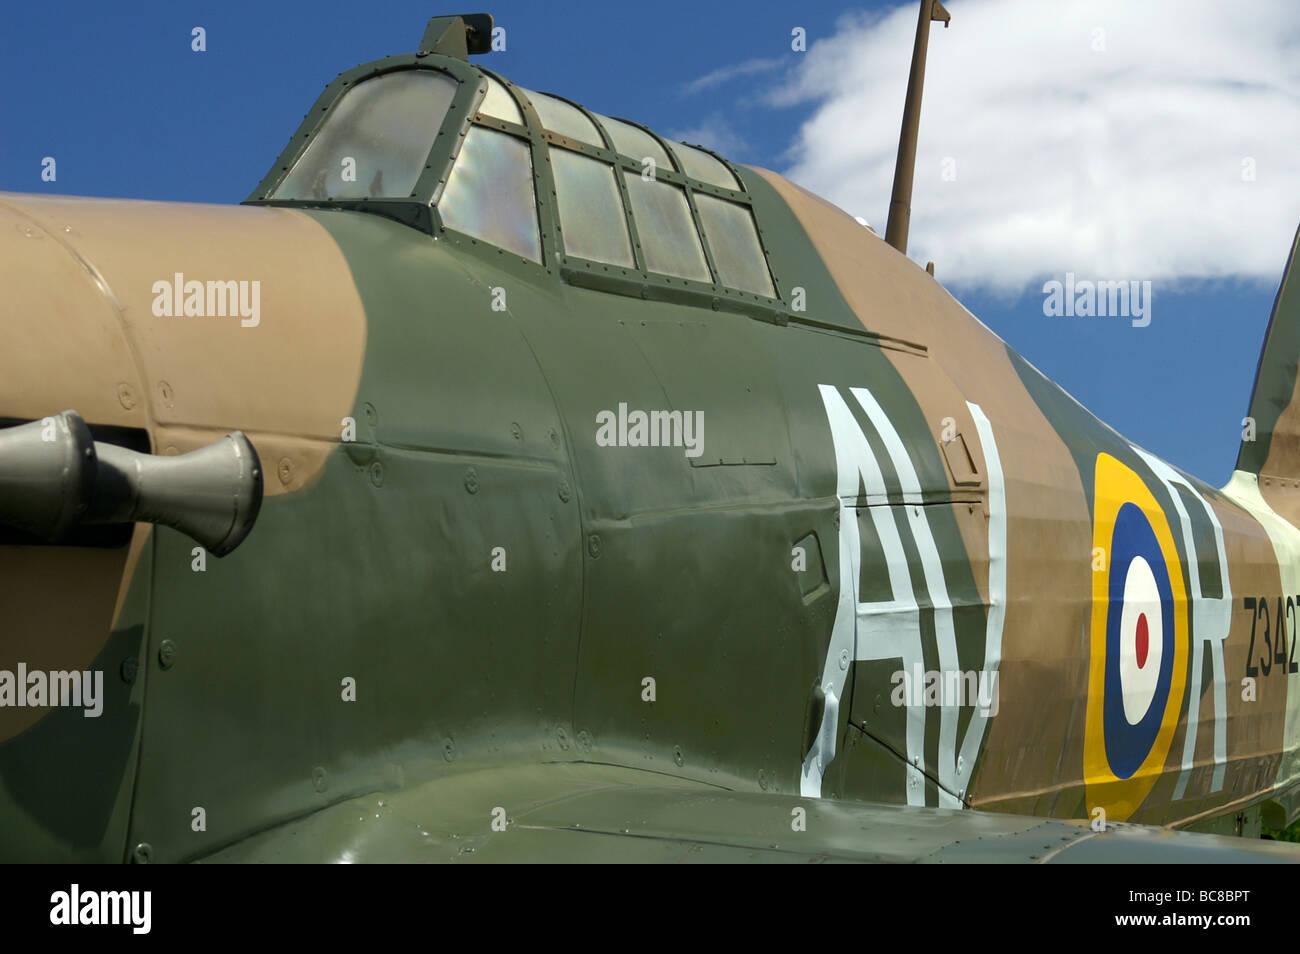 Hurricane in RAF Museum, London - Stock Image